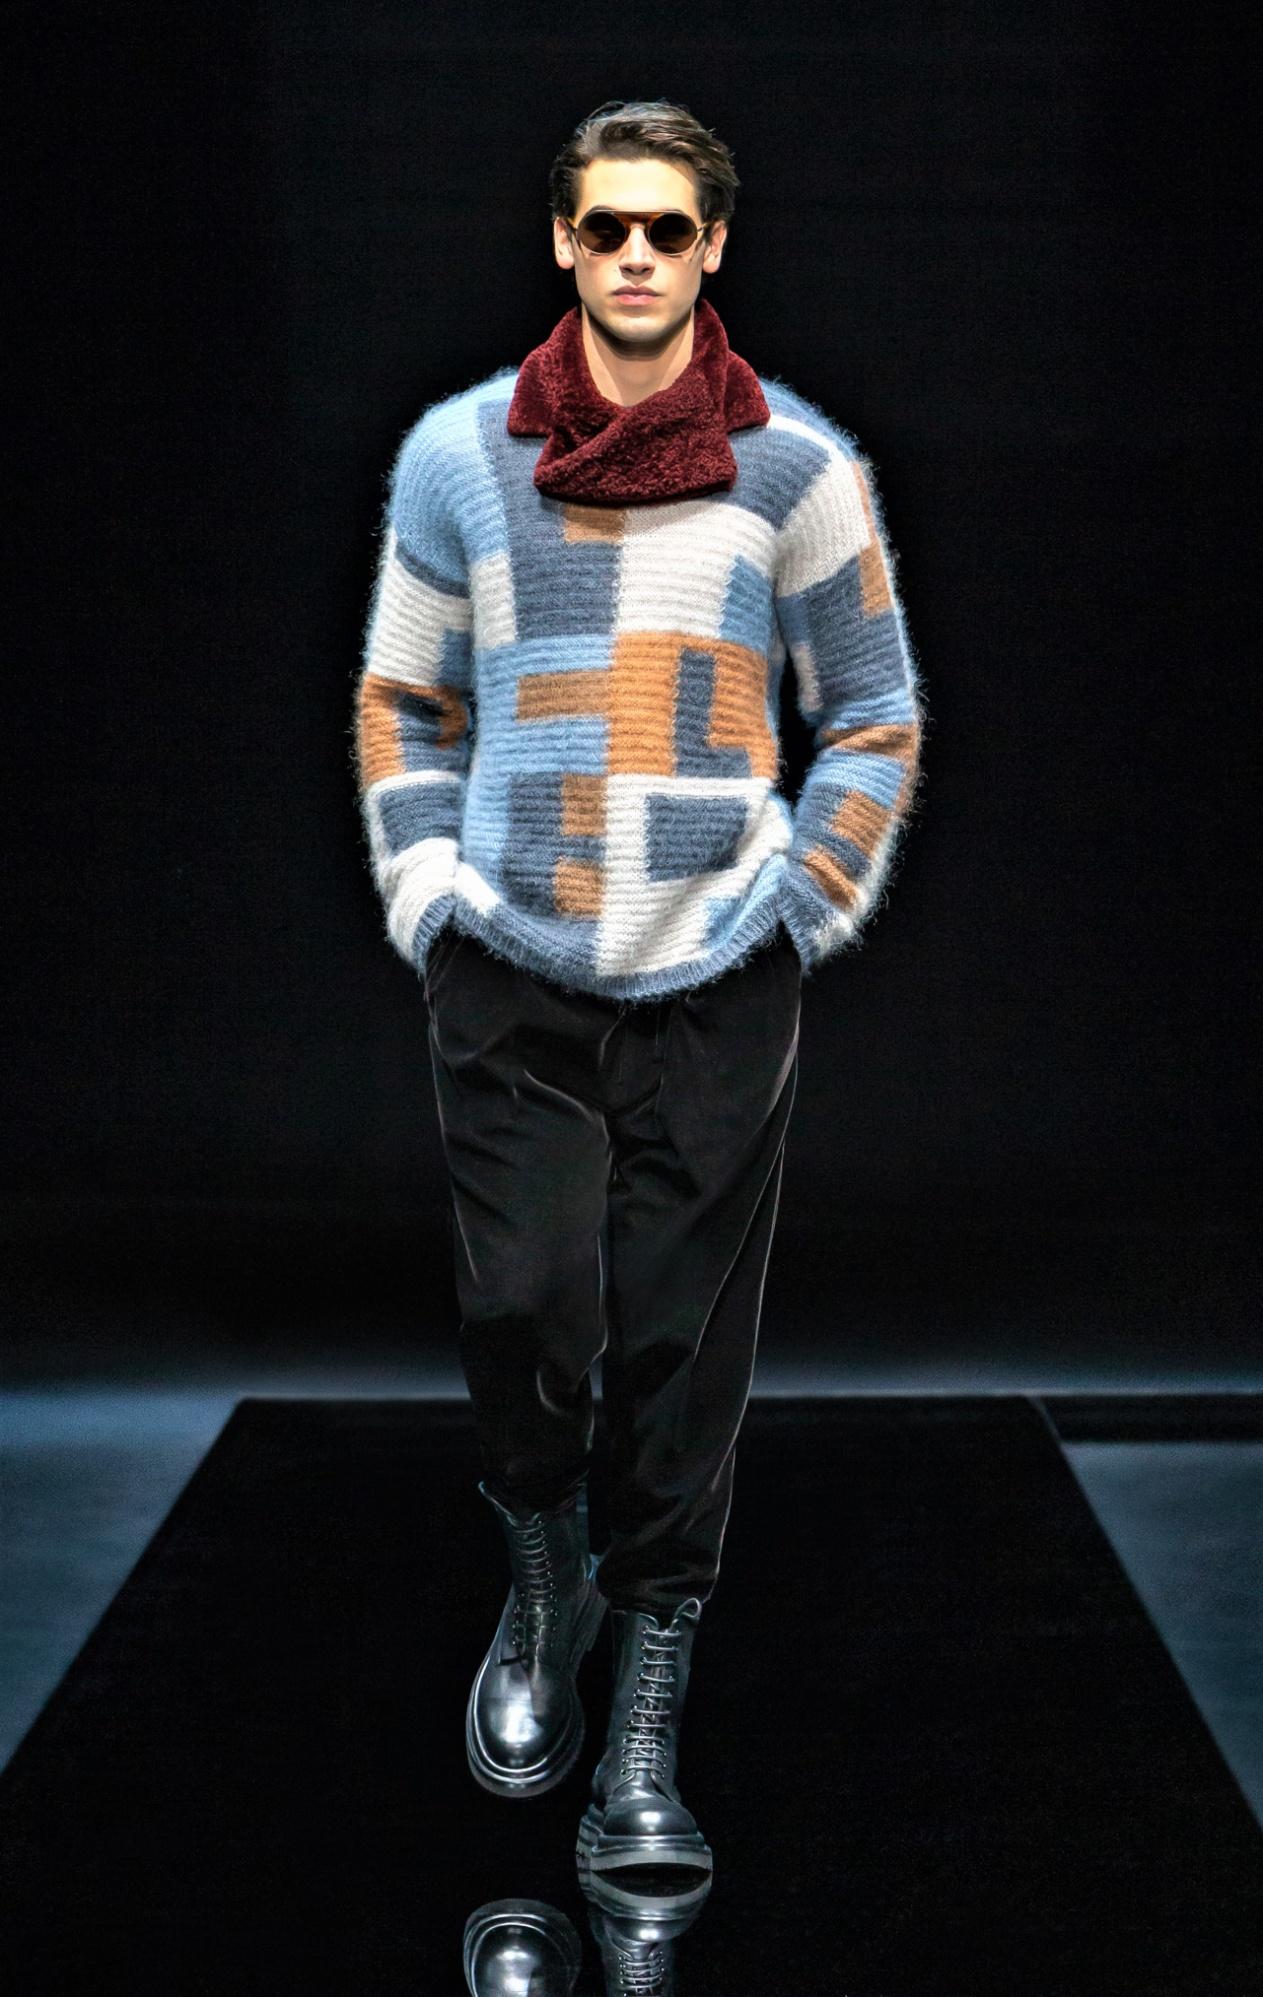 Milan 3 Giorgio-Armani-MENS-Fall-21 sweater vogue cropped.jpg